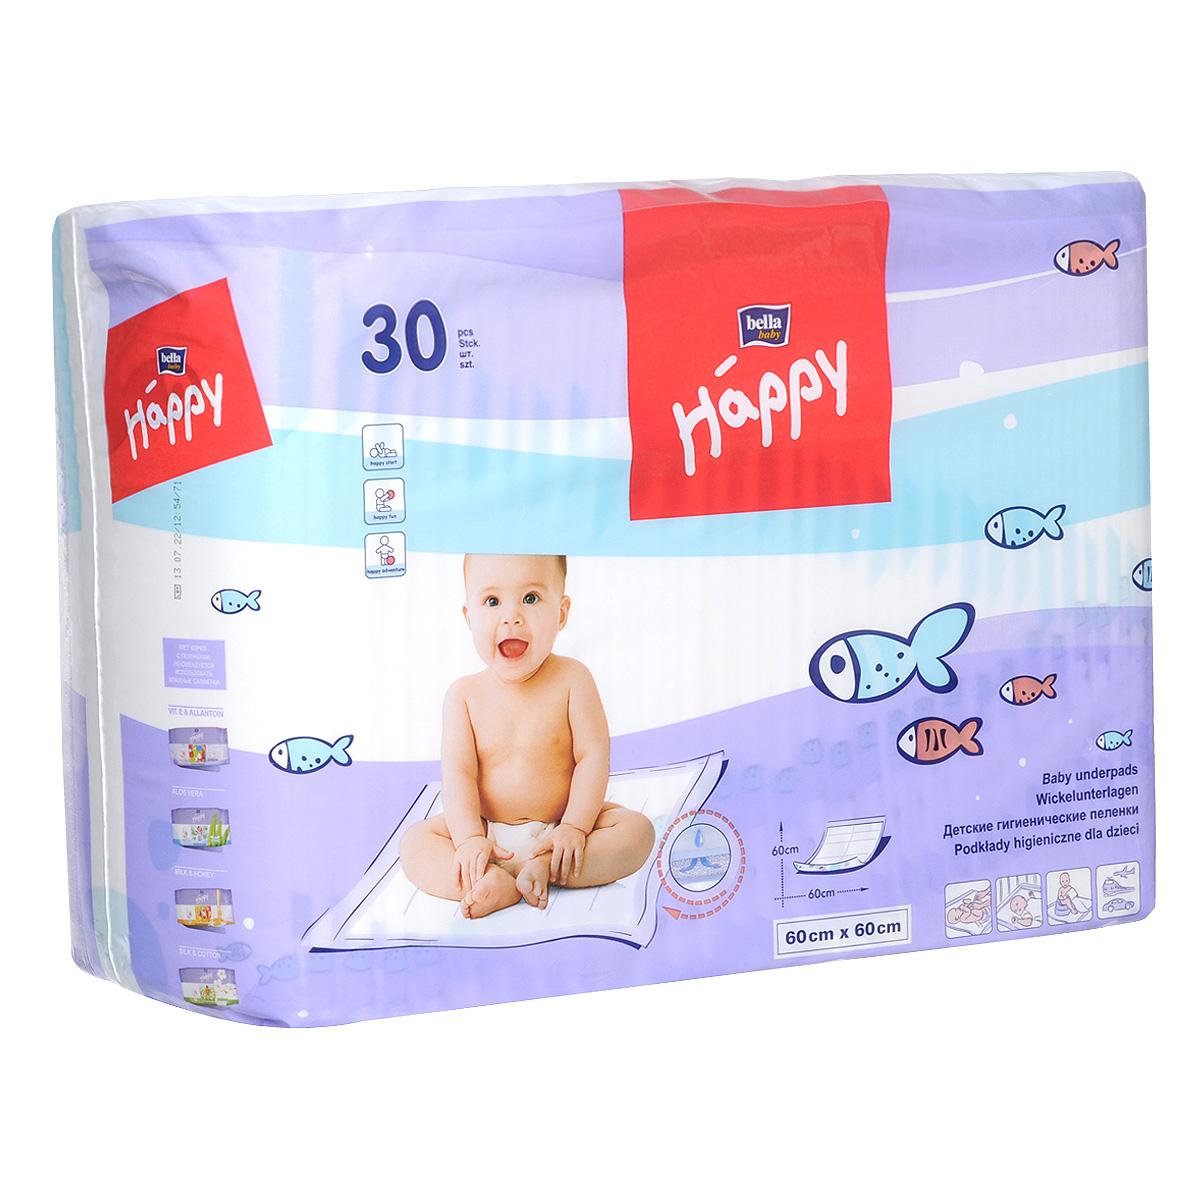 Bella Baby Happy Пеленки гигиенические, детские, 60 см x 60 см, 30 шт bella влажные салфетки baby happy алое вера 56 шт